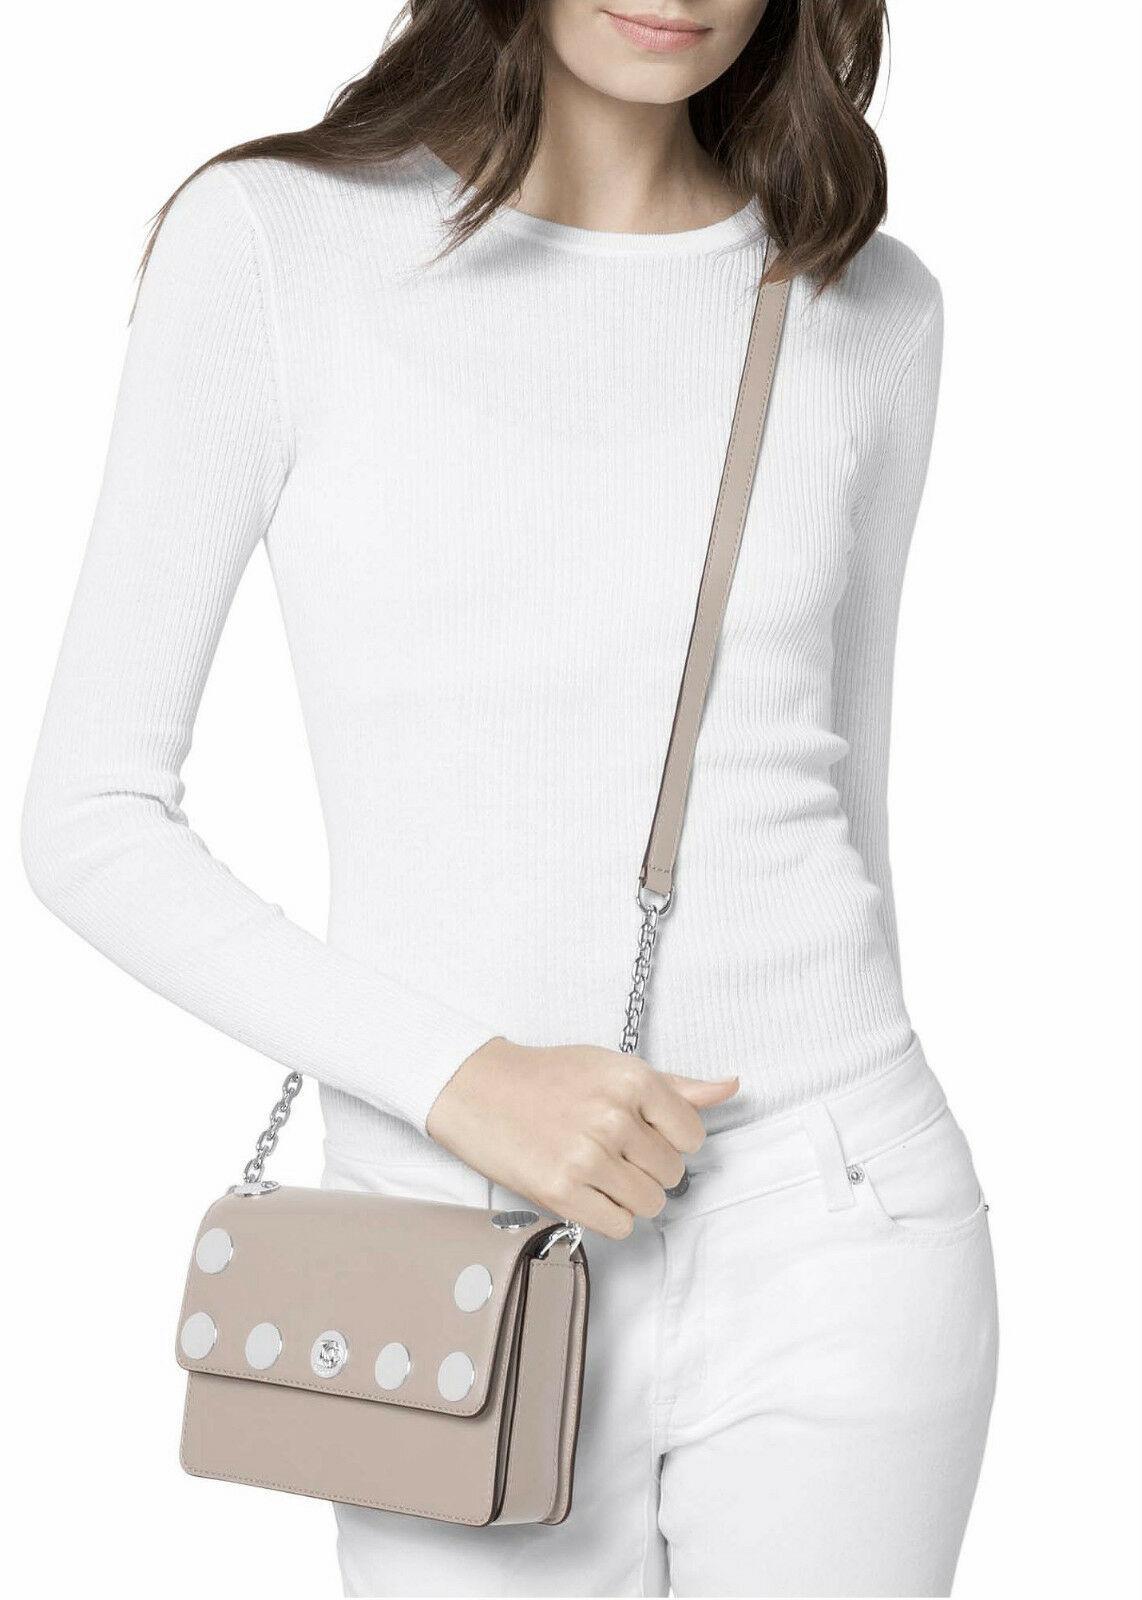 Michael Kors Rivington Stud Natalie Small Chain Messenger Handbag Cement Leather